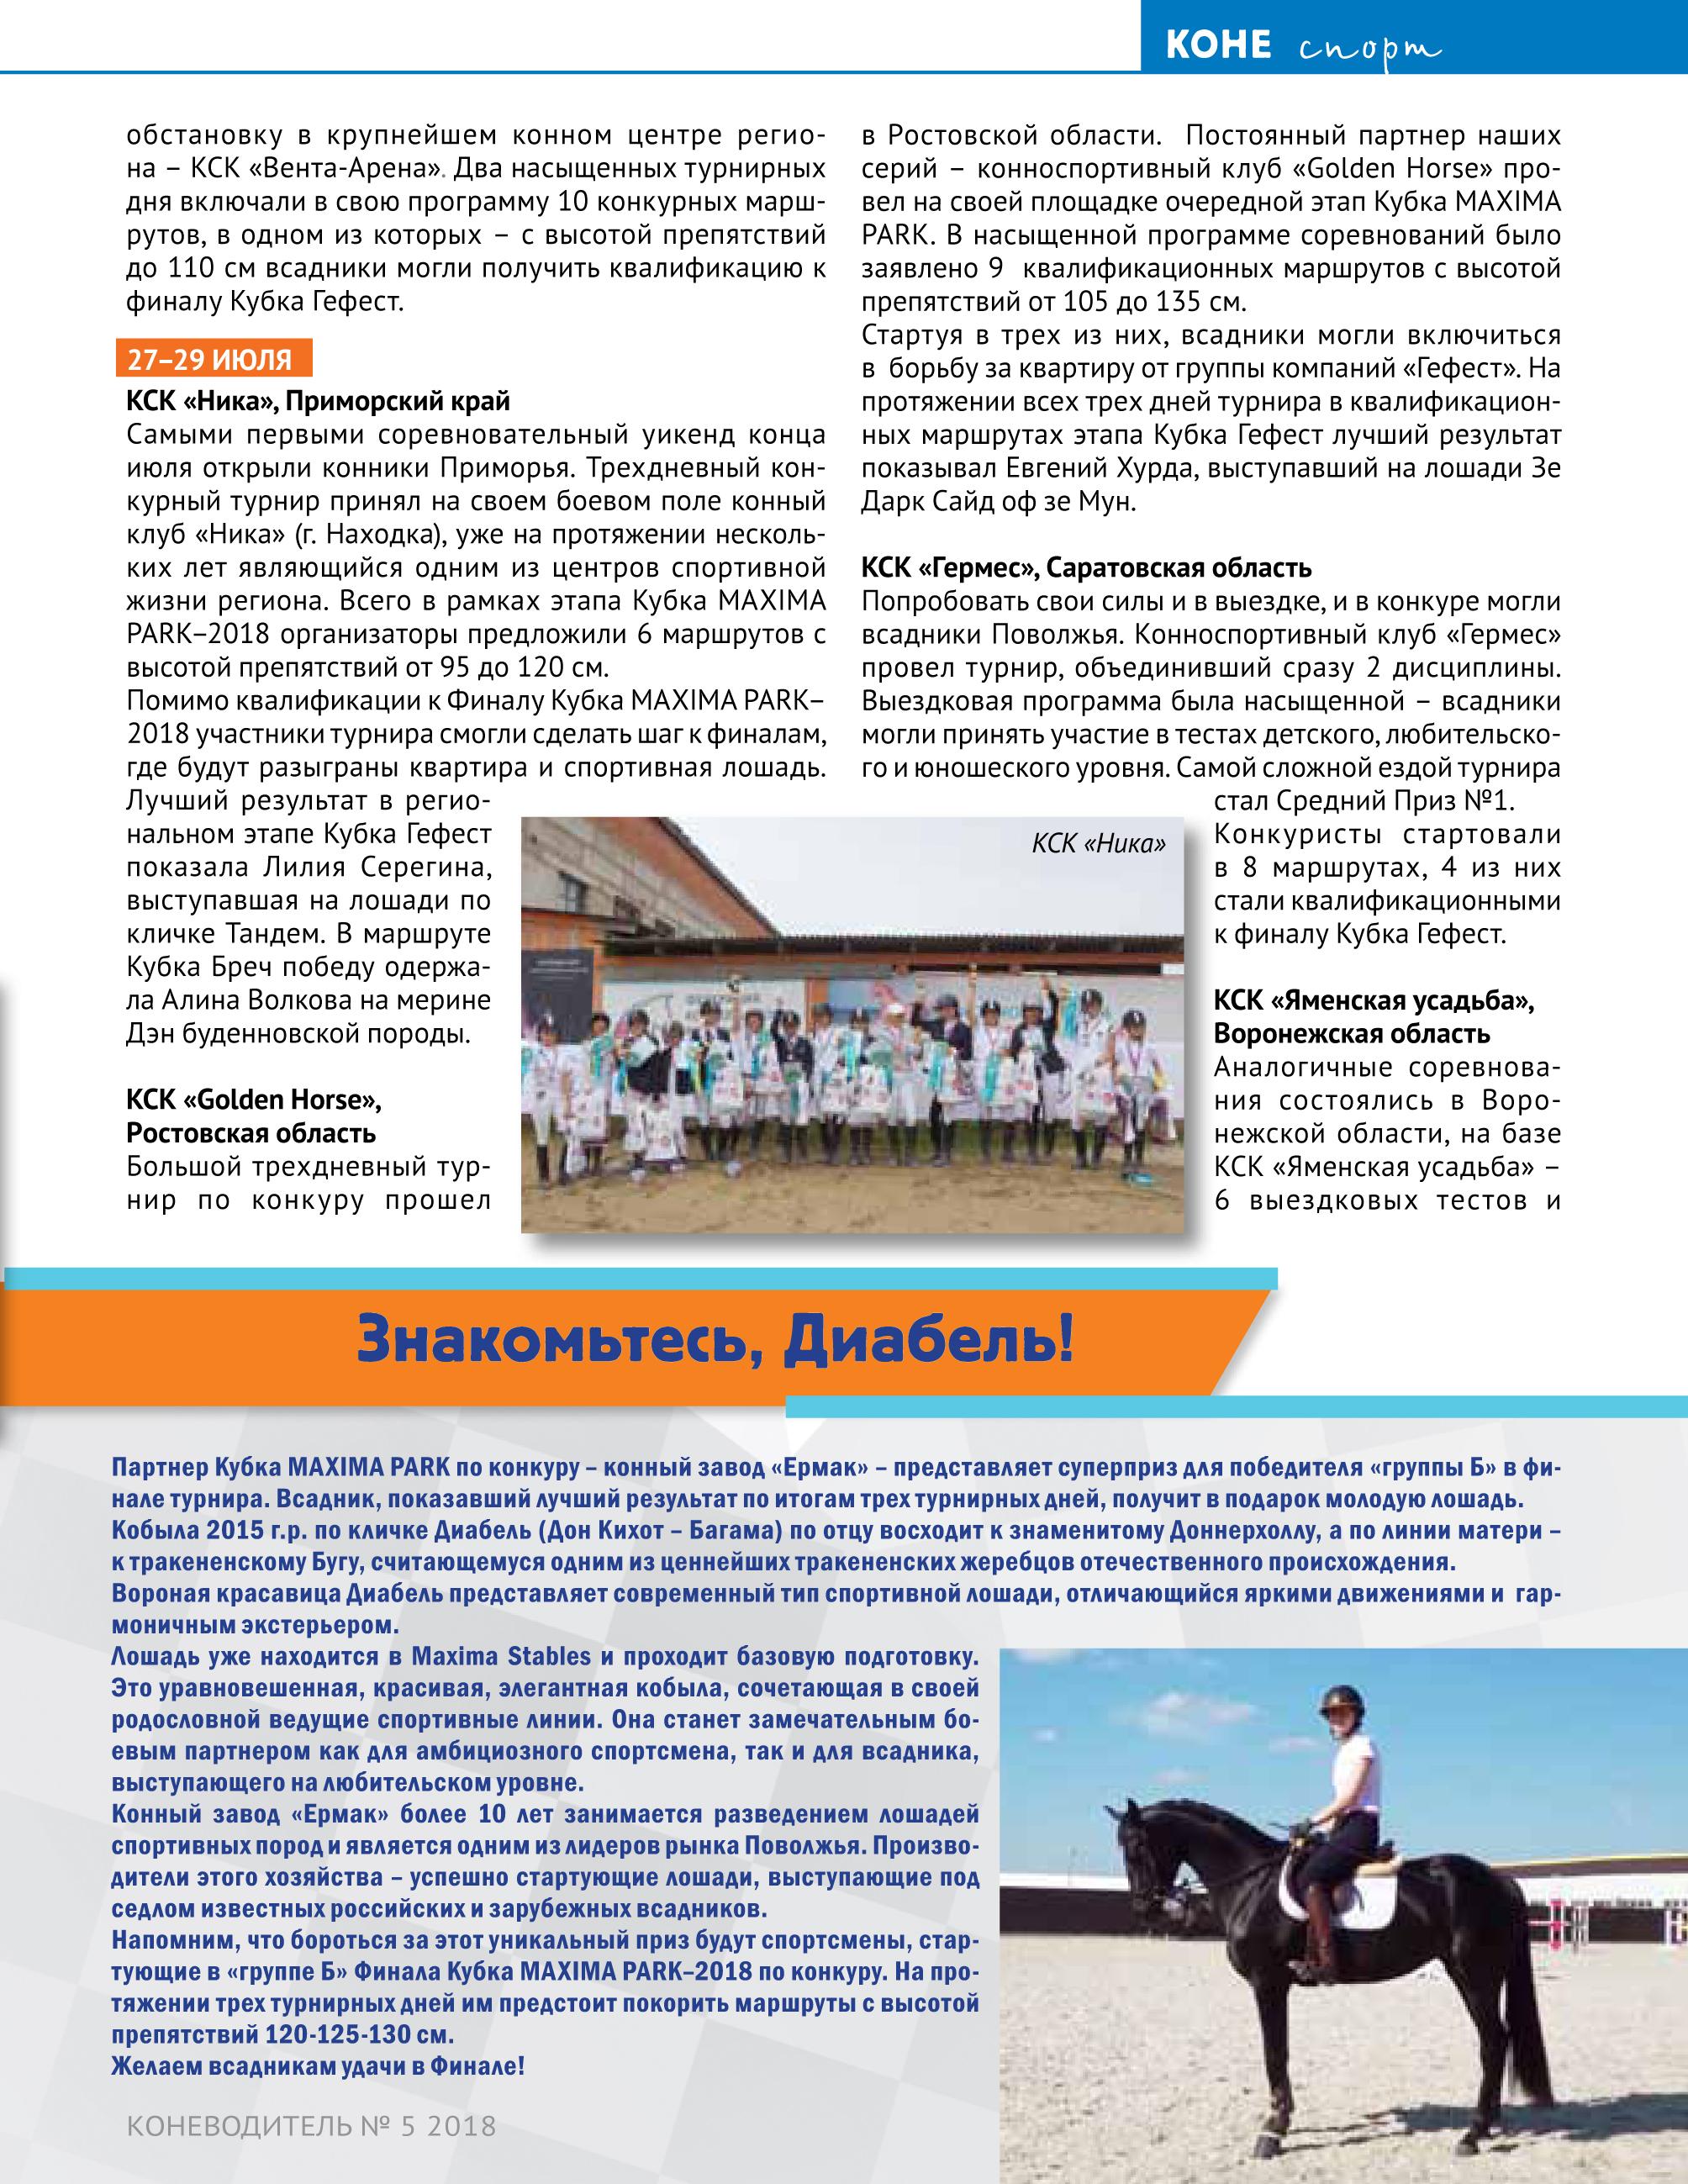 Book 5 2018 ДЛЯ САЙТА-33